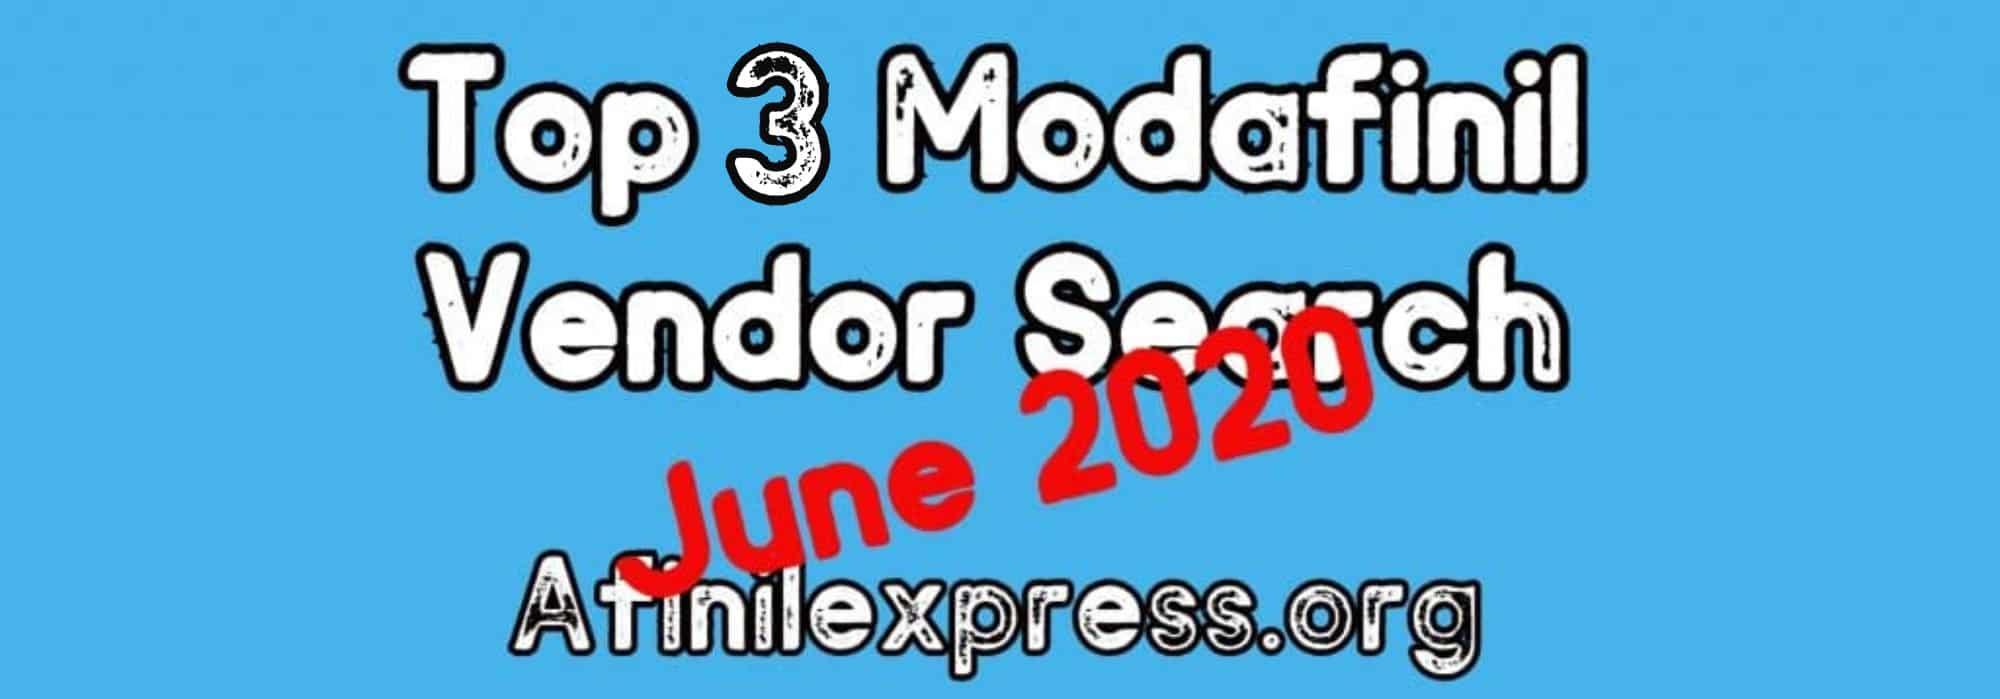 Top 3 Modafinil sites June 2020